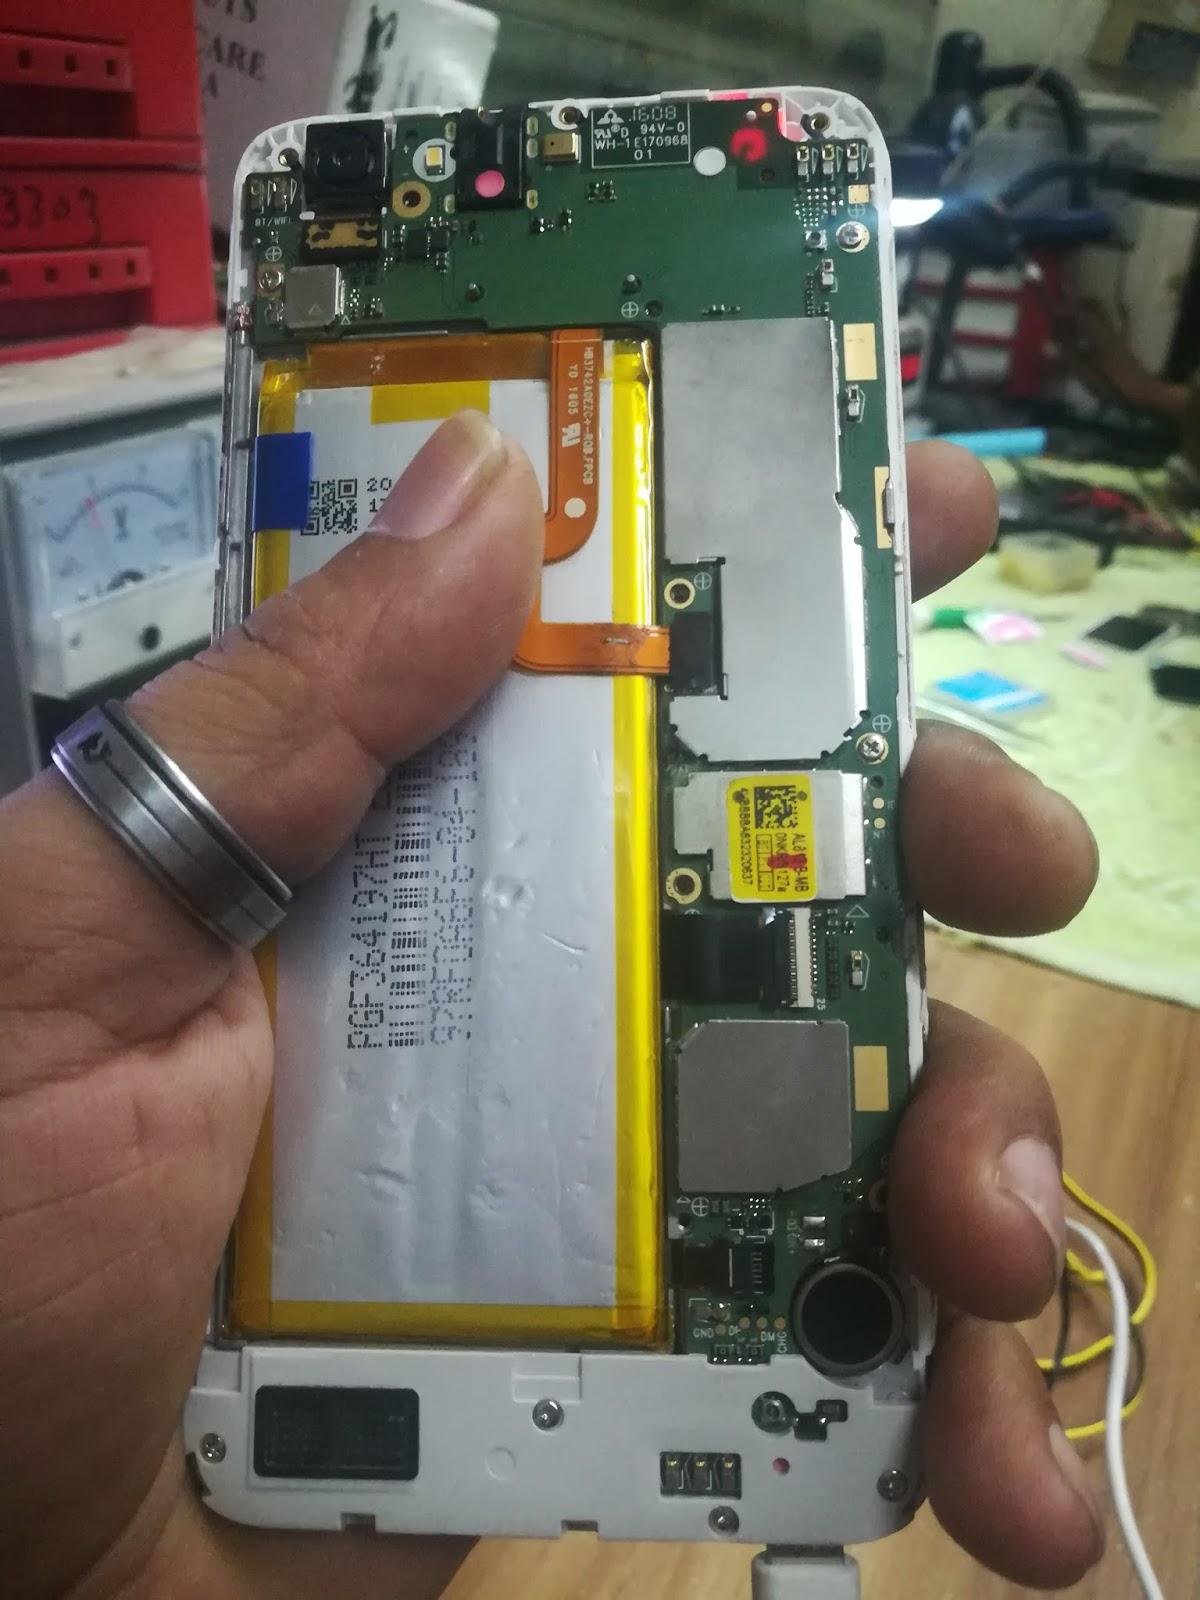 HUAWEI TAG-L13 Dead Boot Repair Firmware Flash File MT6753